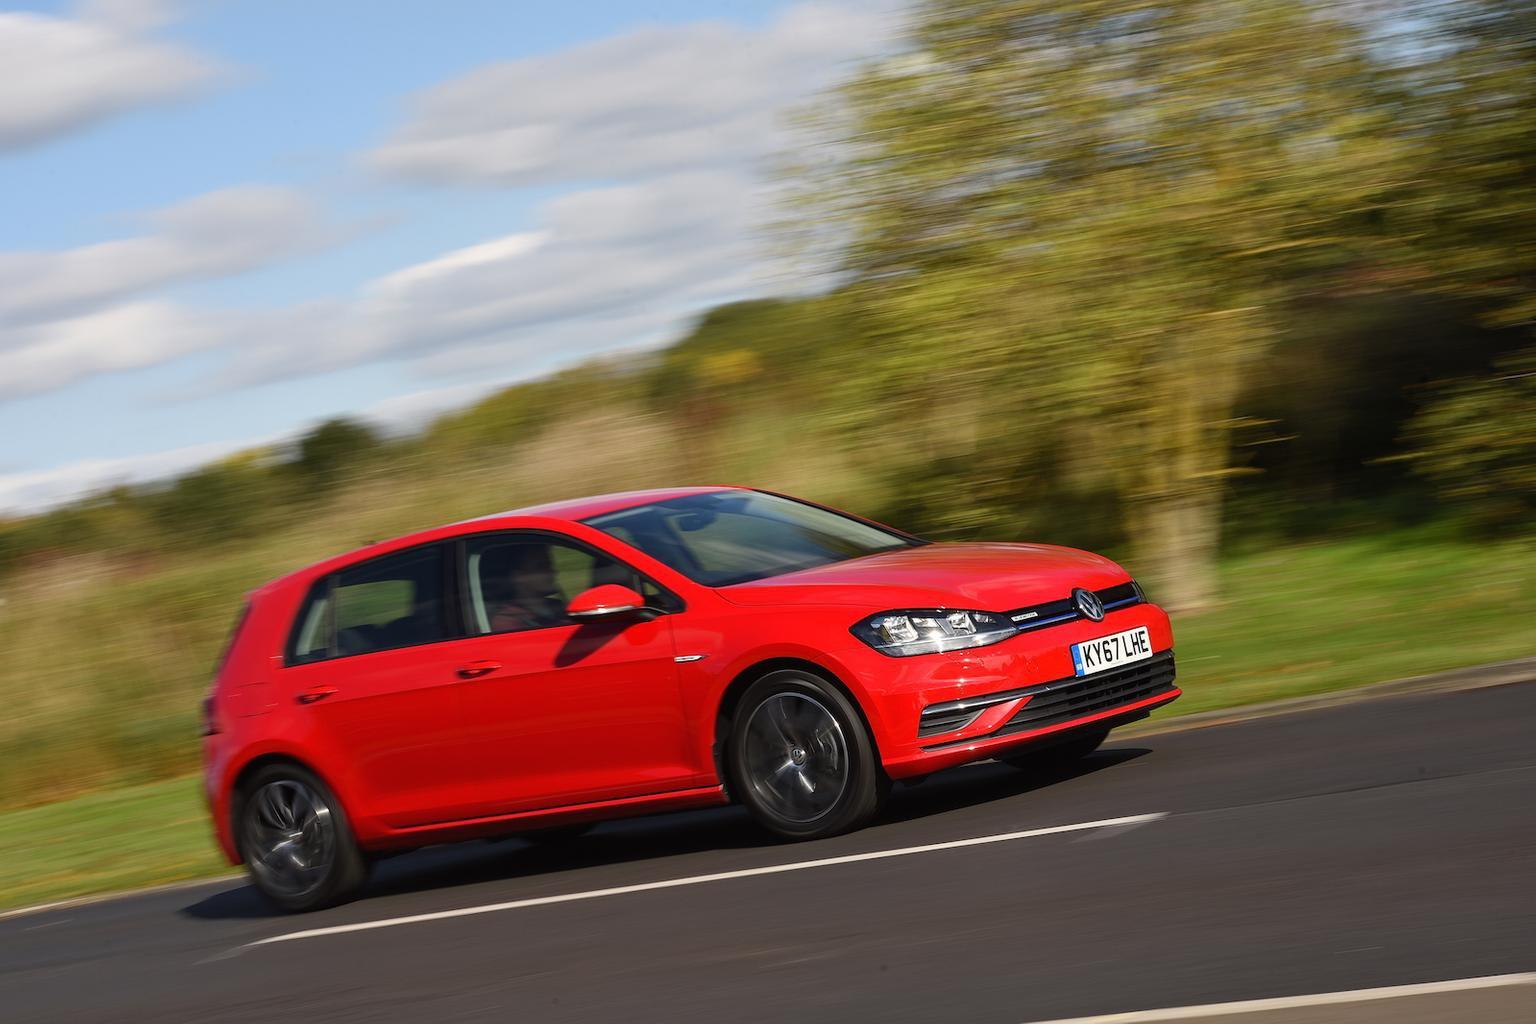 2017 Volkswagen Golf 1.5 TSI Evo review - verdict